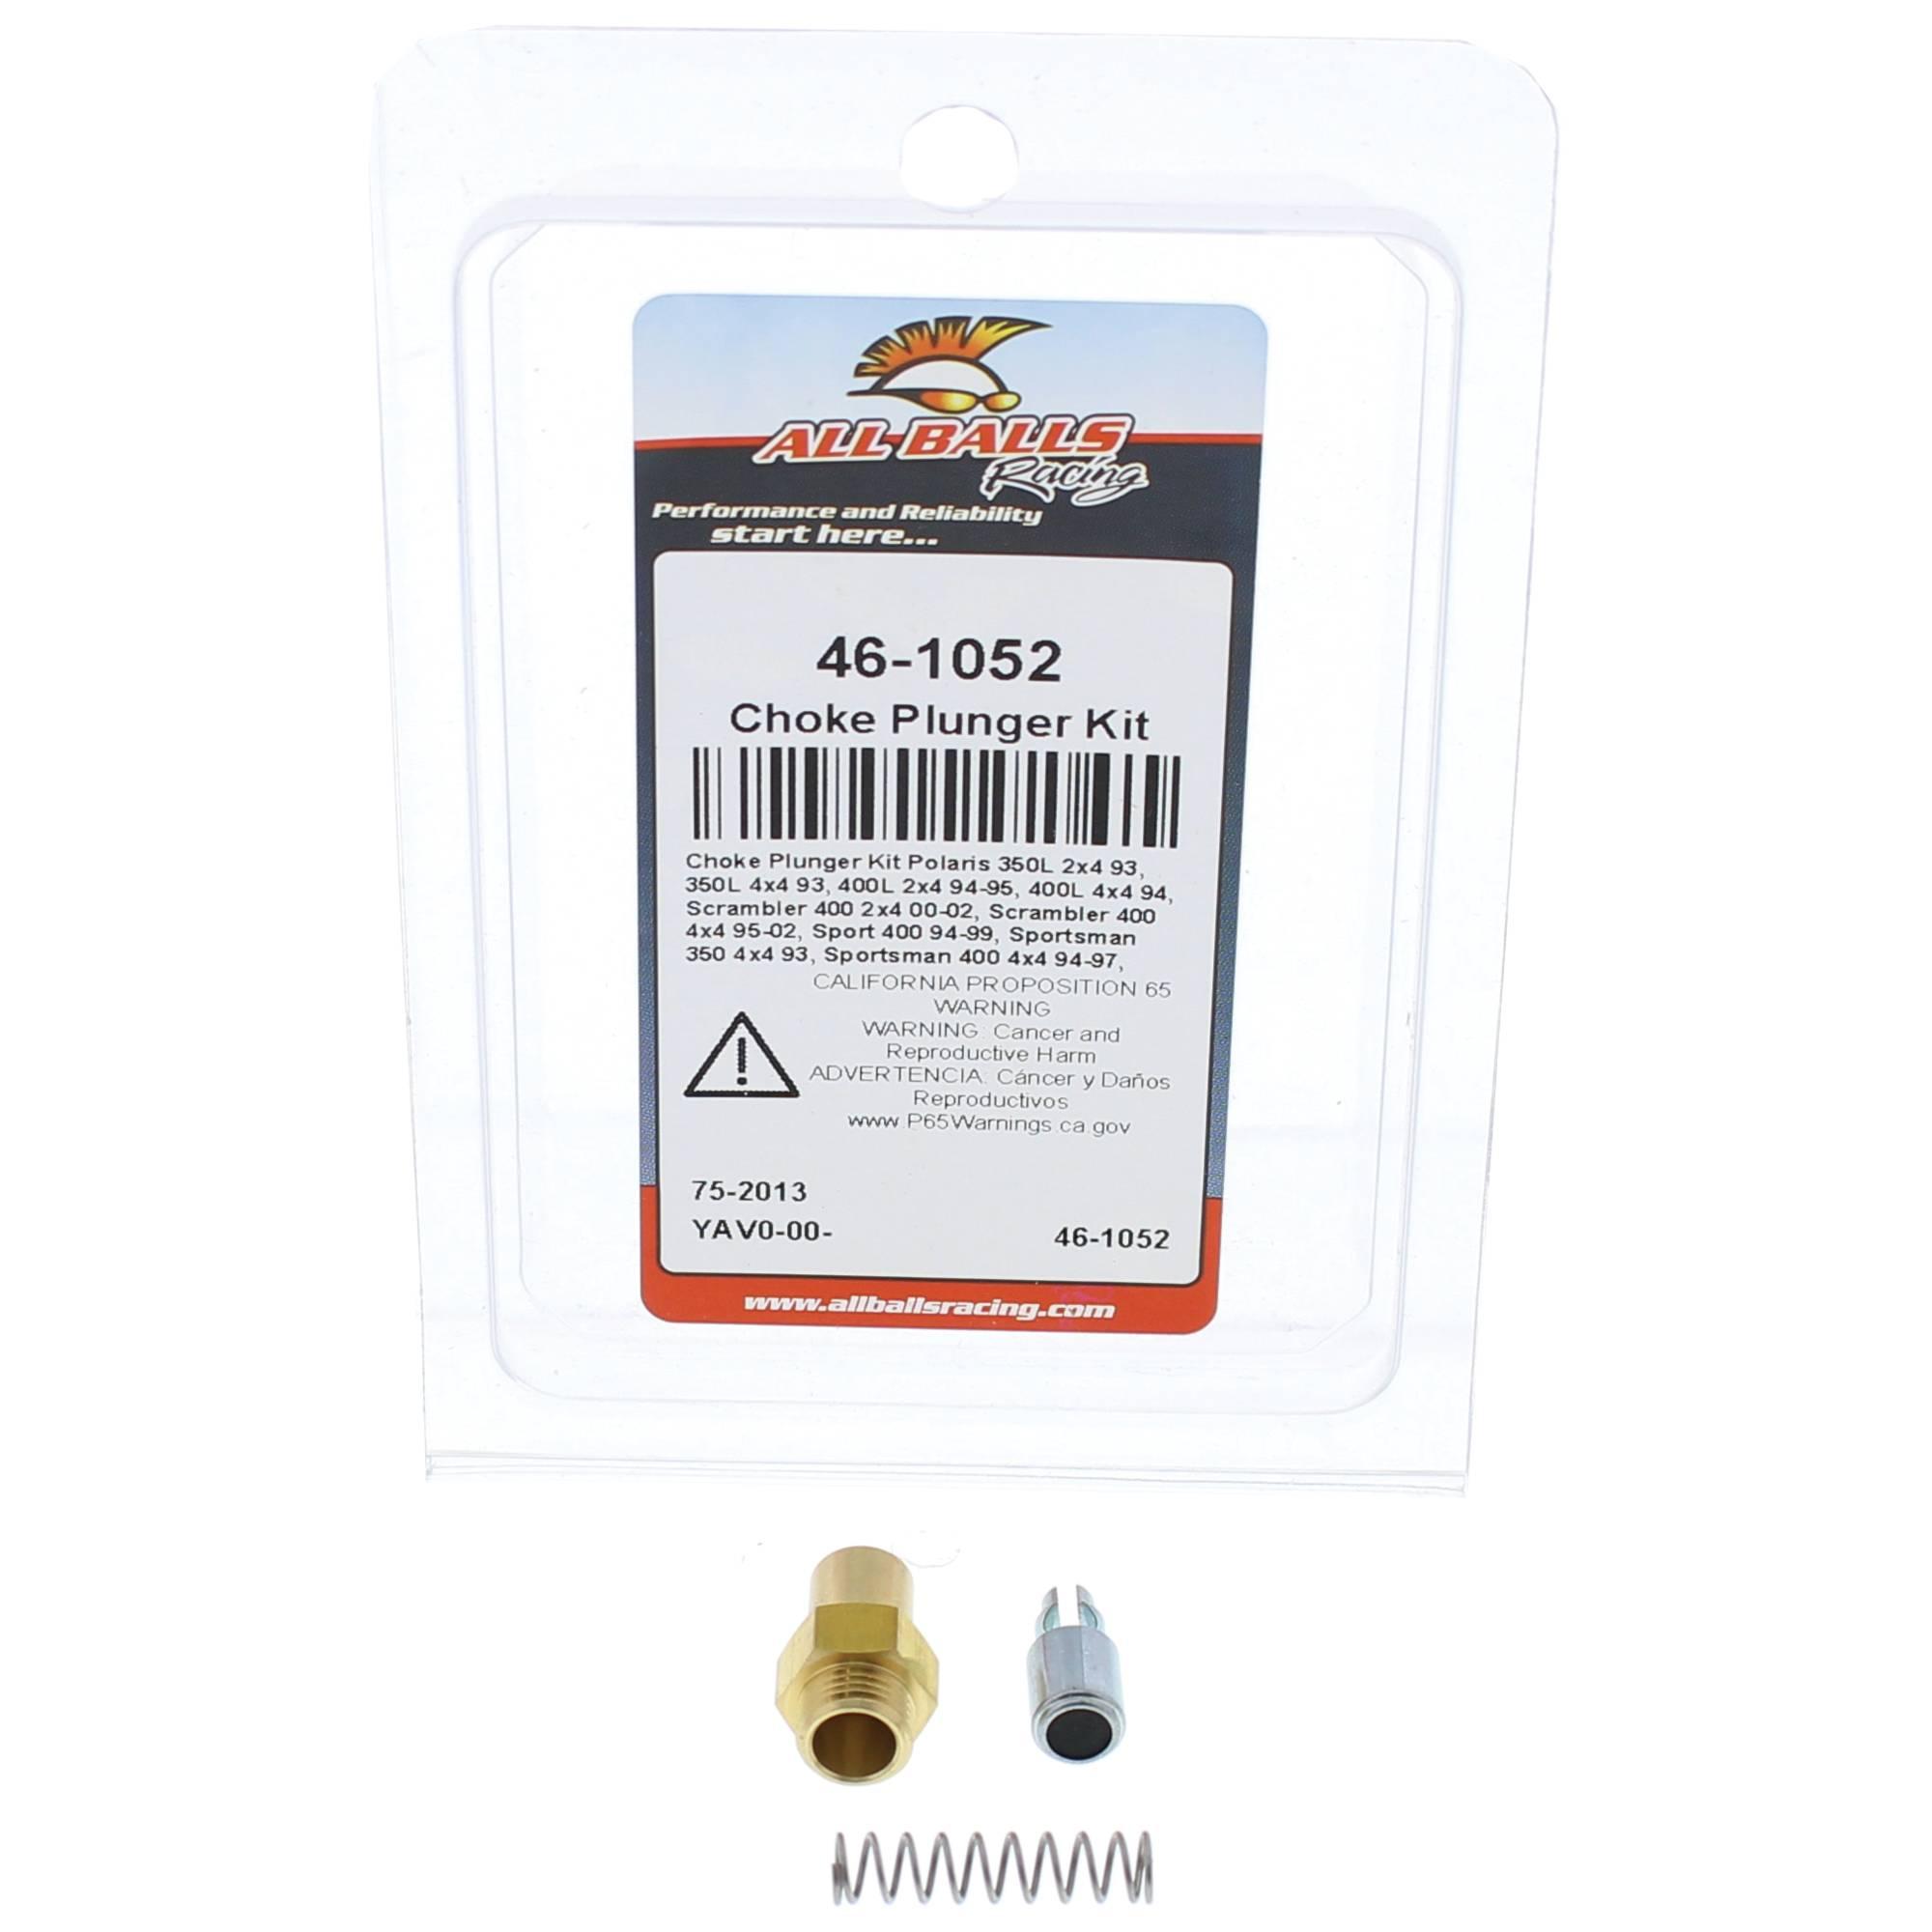 All Balls Choke Plunger Kit (46-1052) for Polaris Scrambler 400 2x4 00 01 02